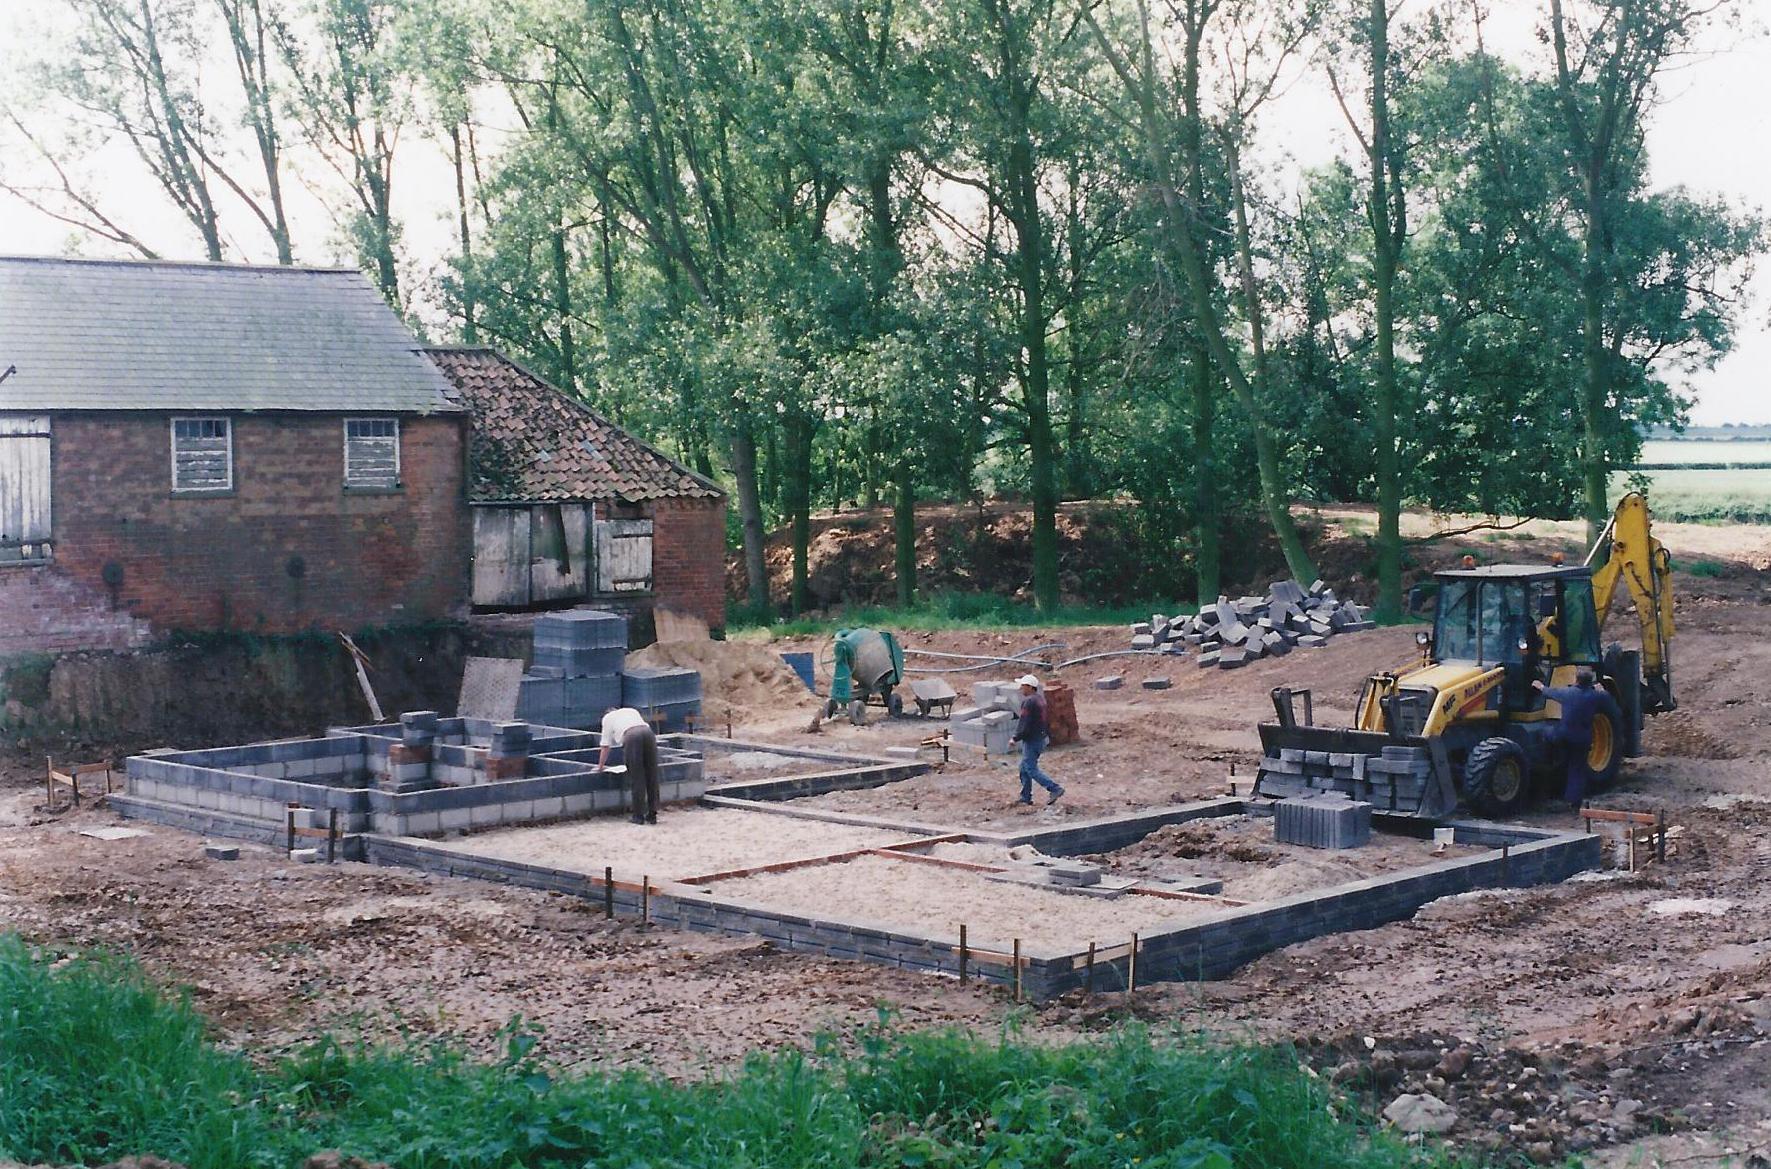 Construction Image 3 - North End Farm - East Yorkshire Architects - Samuel Kendall Associates